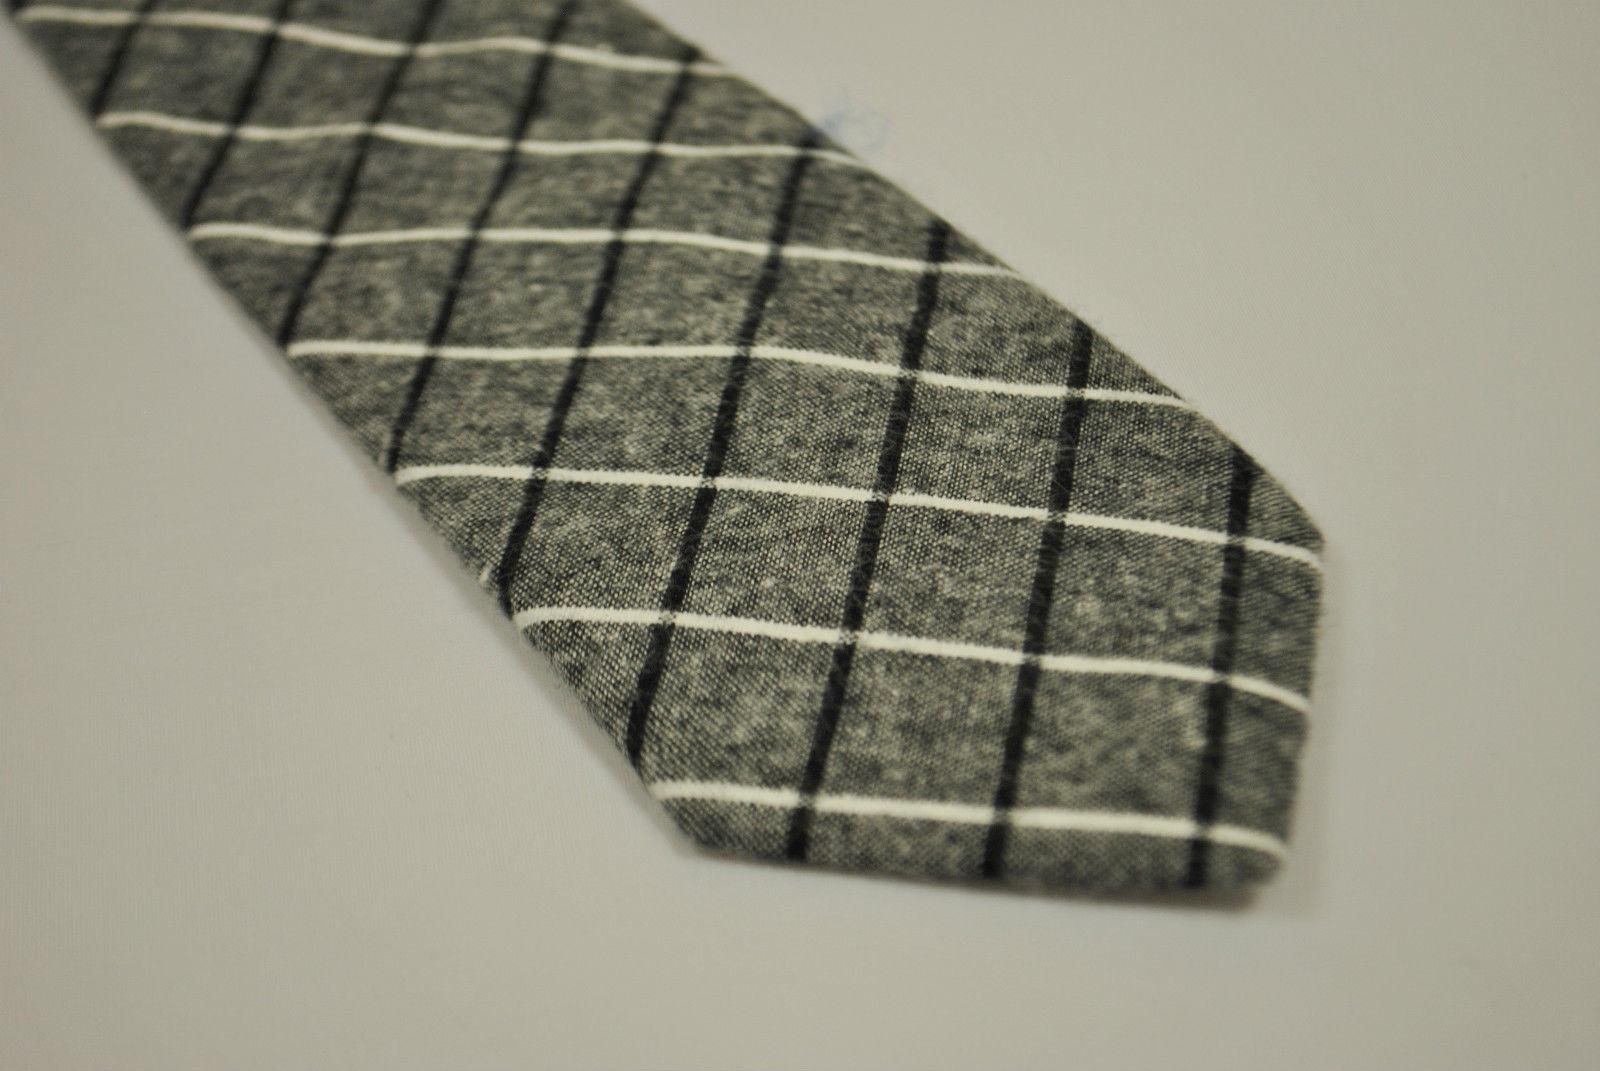 Frederick Thomas grau/grau schwarz & weiß kariert 100% Baumwolle ft2154